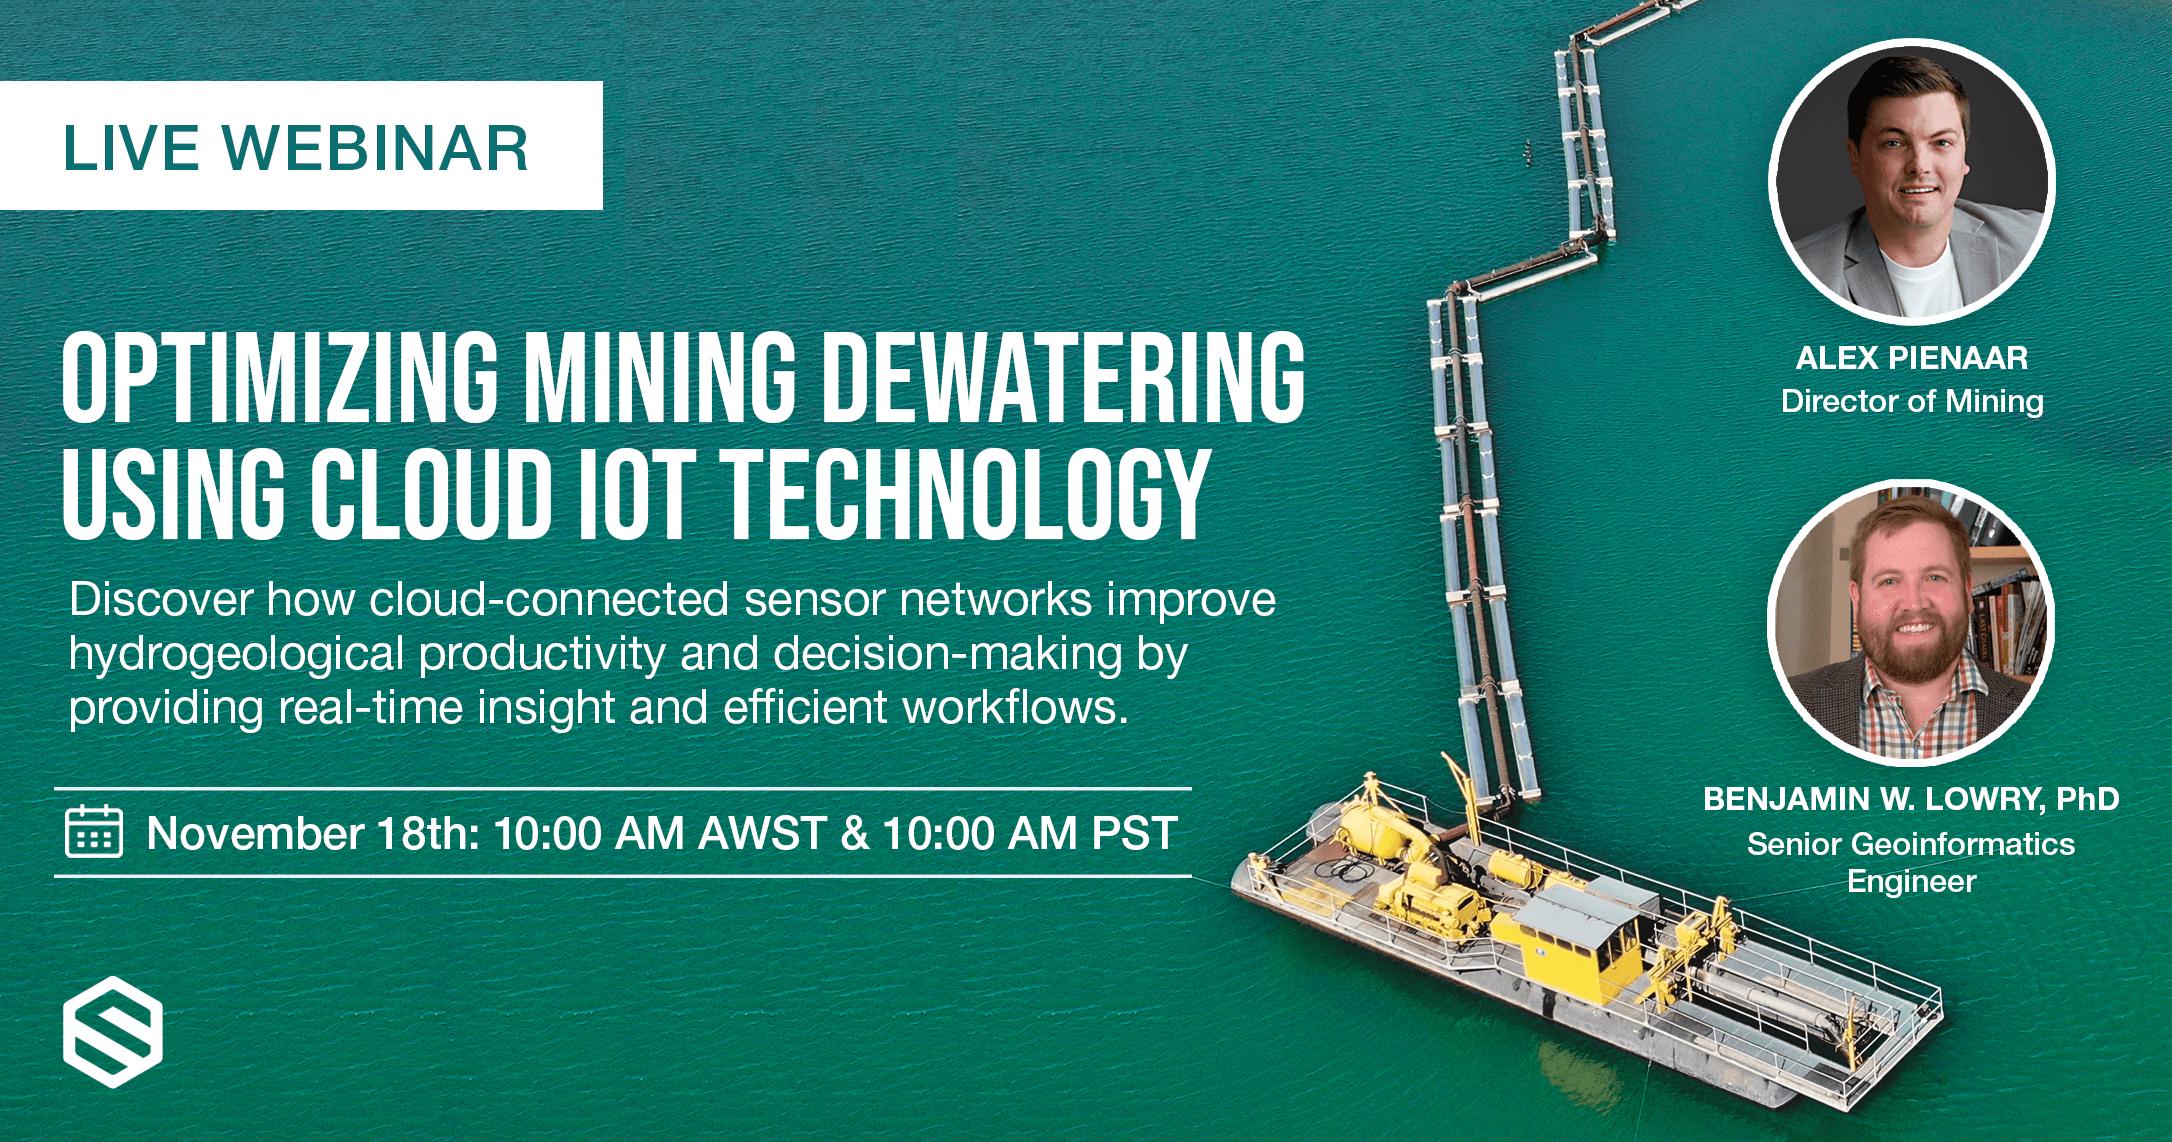 Live Webinar: Optimizing Mining Dewatering